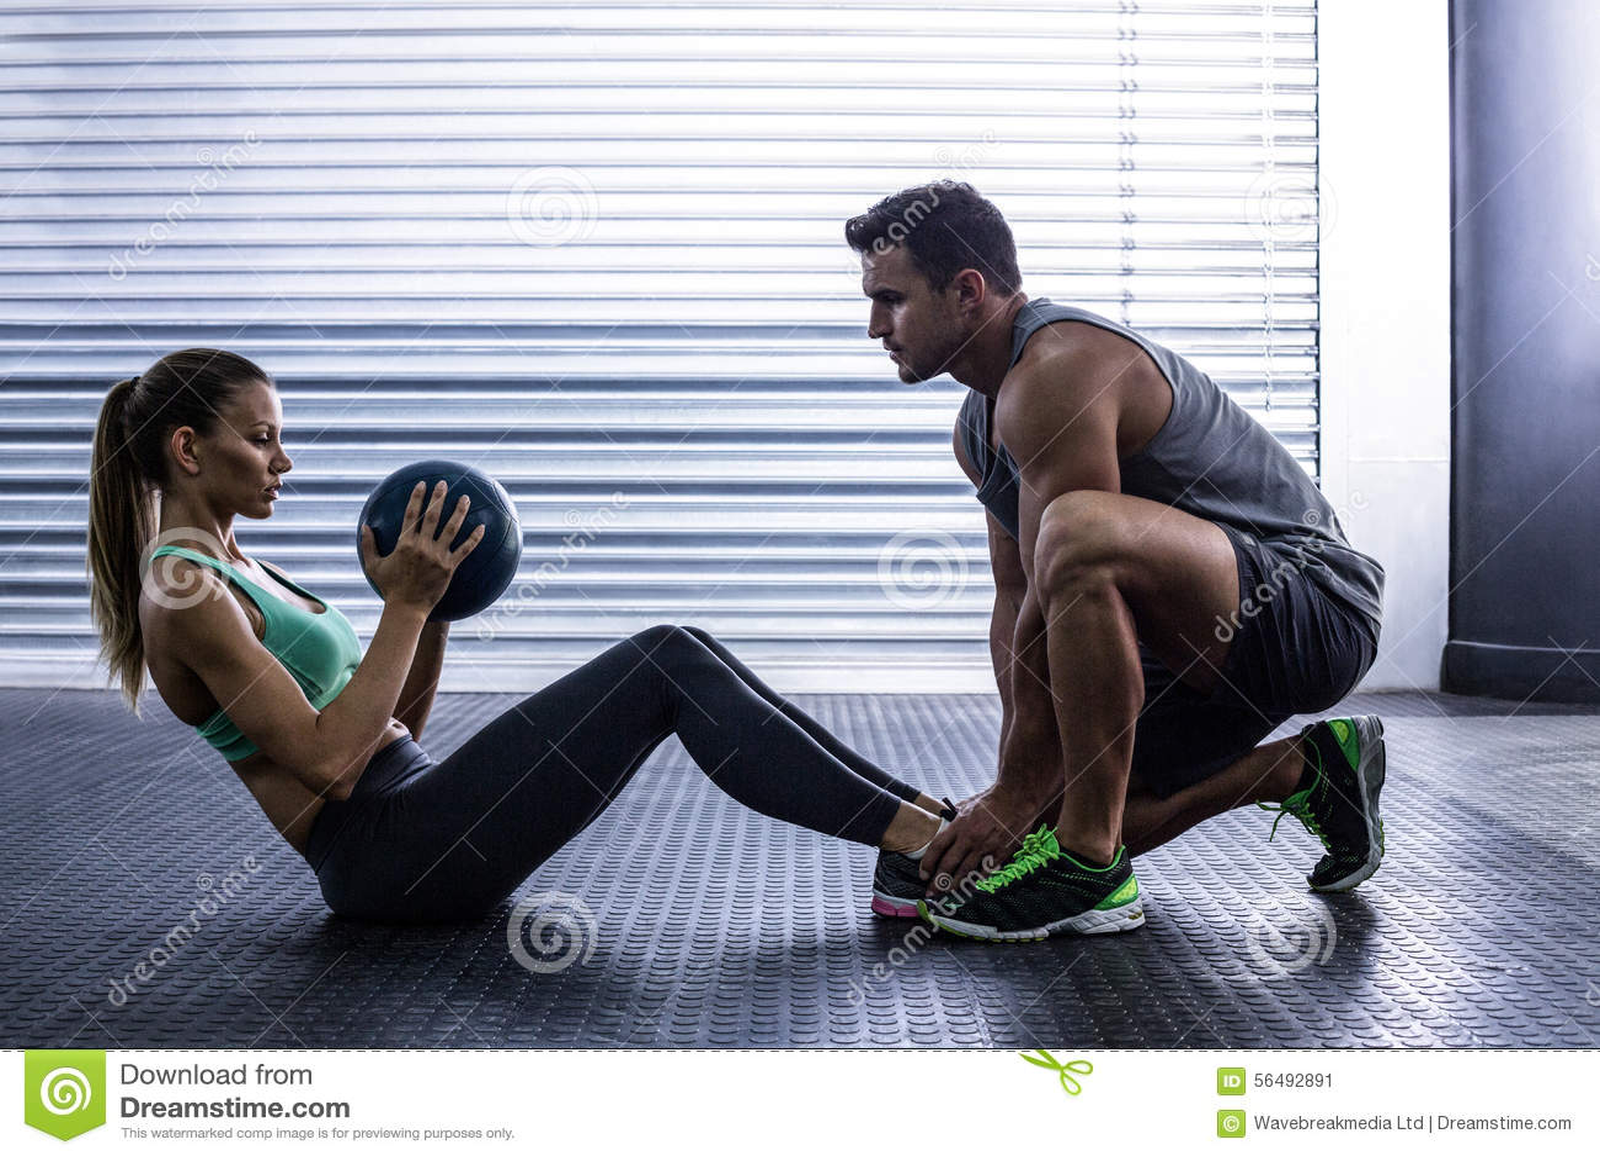 Muscular couple doing abdominal ball exercise